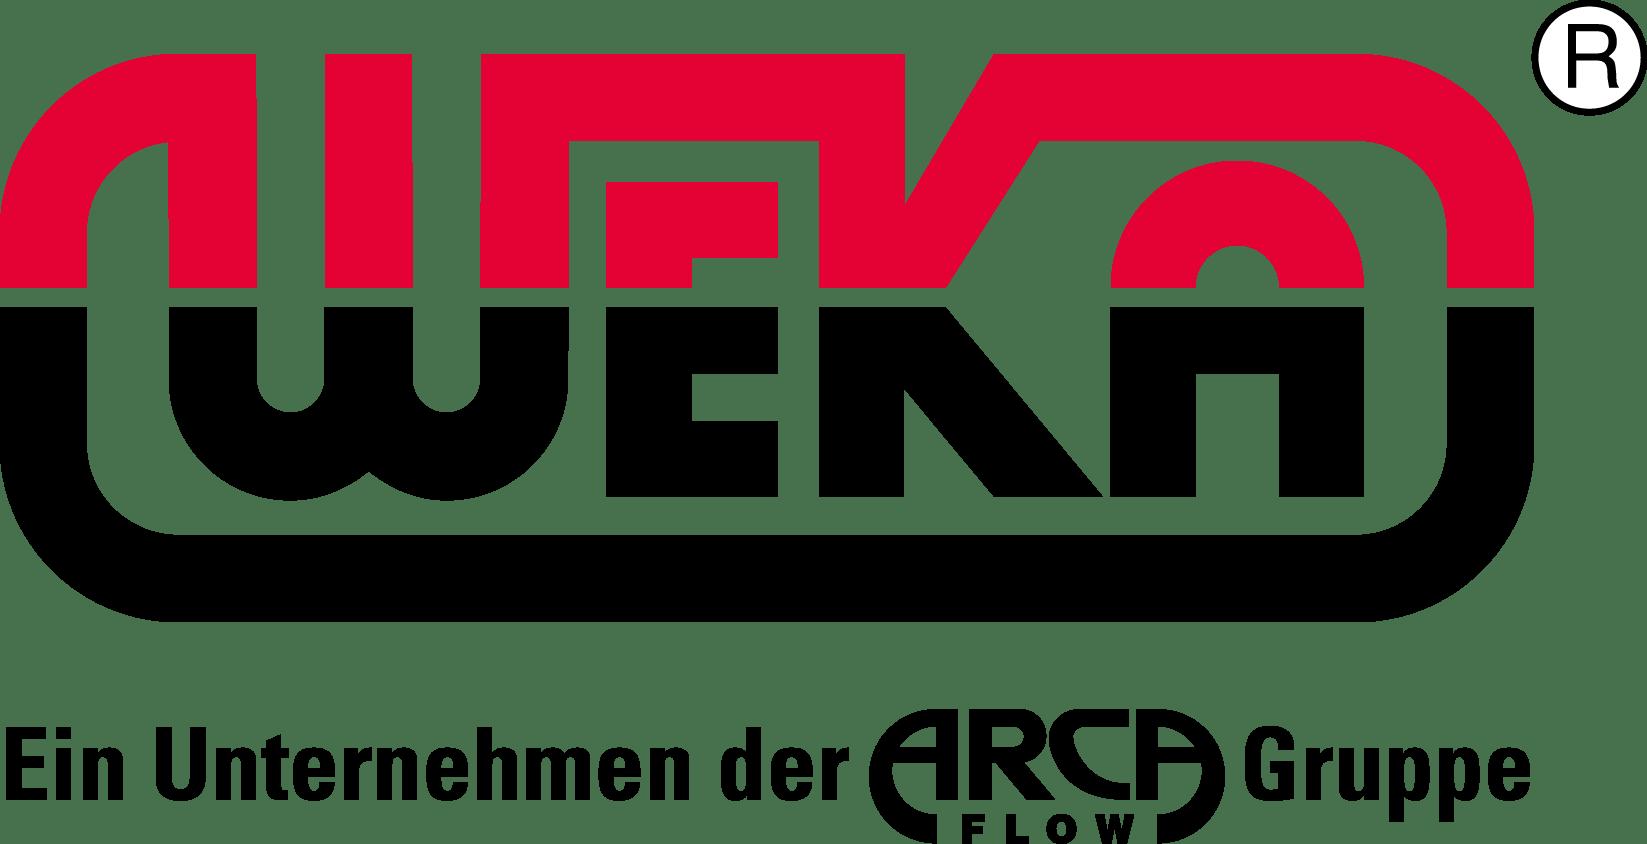 20200122-company-factory-zuerich-winterthur-2020-logo-weka